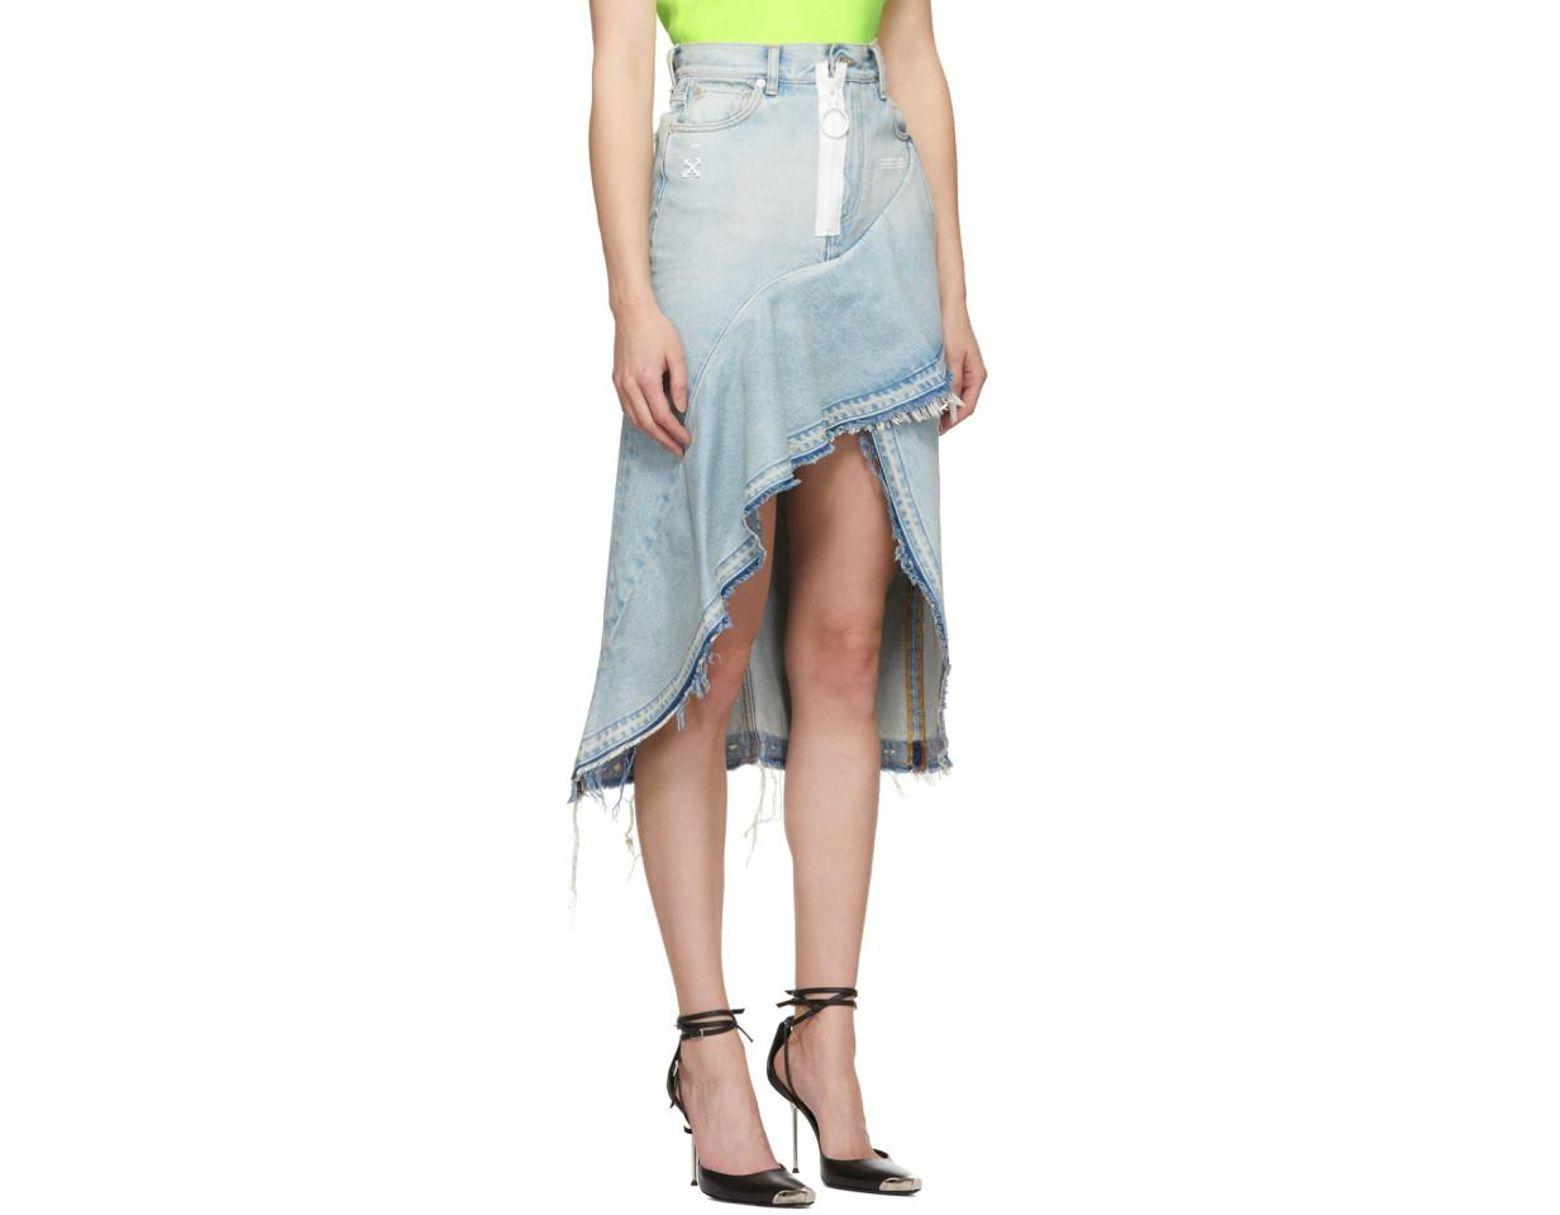 f75a54cc34 Off-White c/o Virgil Abloh Asymmetric Denim Skirt in Blue - Save 67% - Lyst